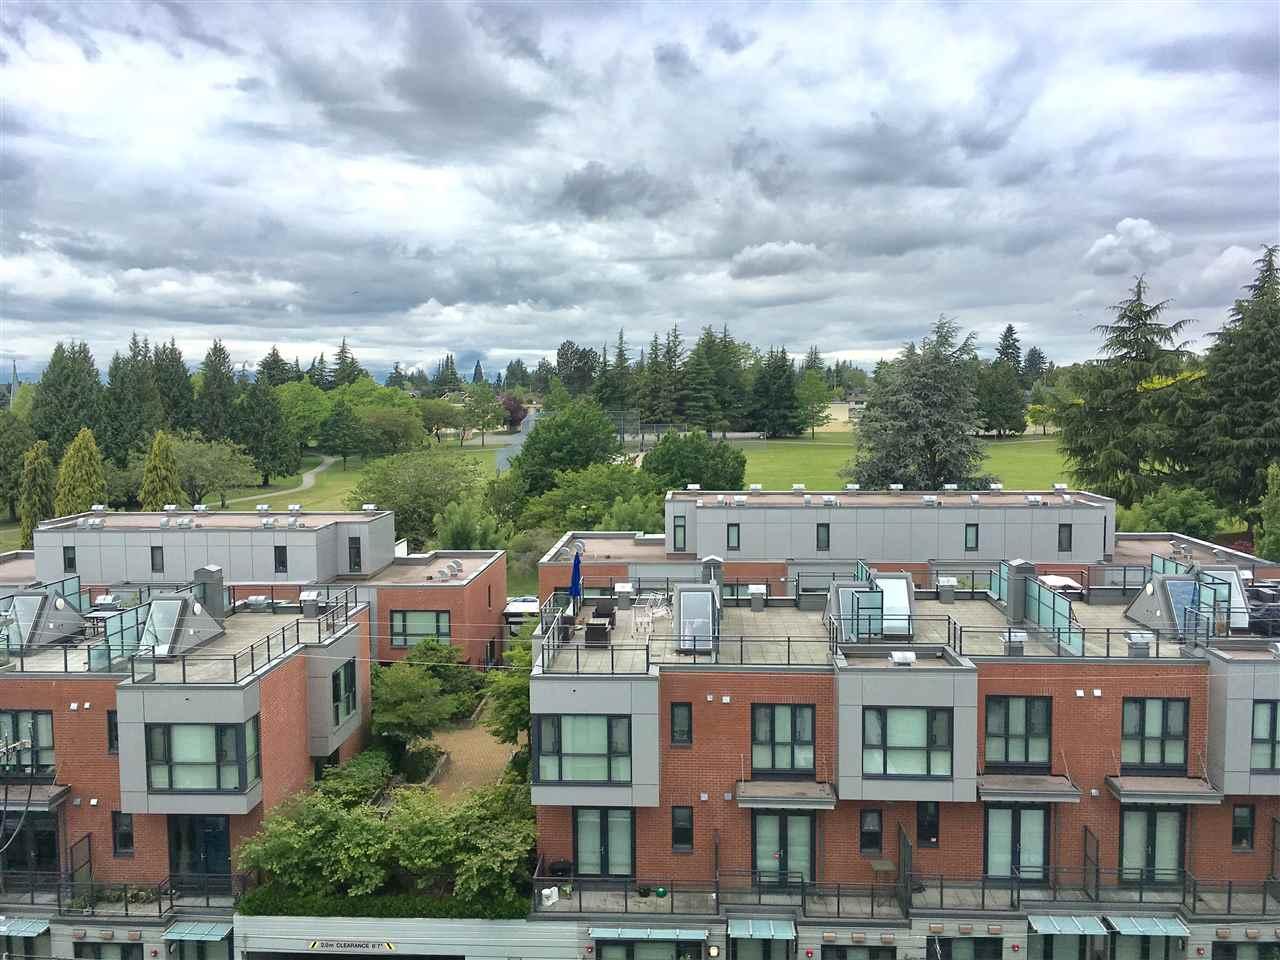 Condo Apartment at 702 6383 CAMBIE STREET, Unit 702, Vancouver West, British Columbia. Image 1